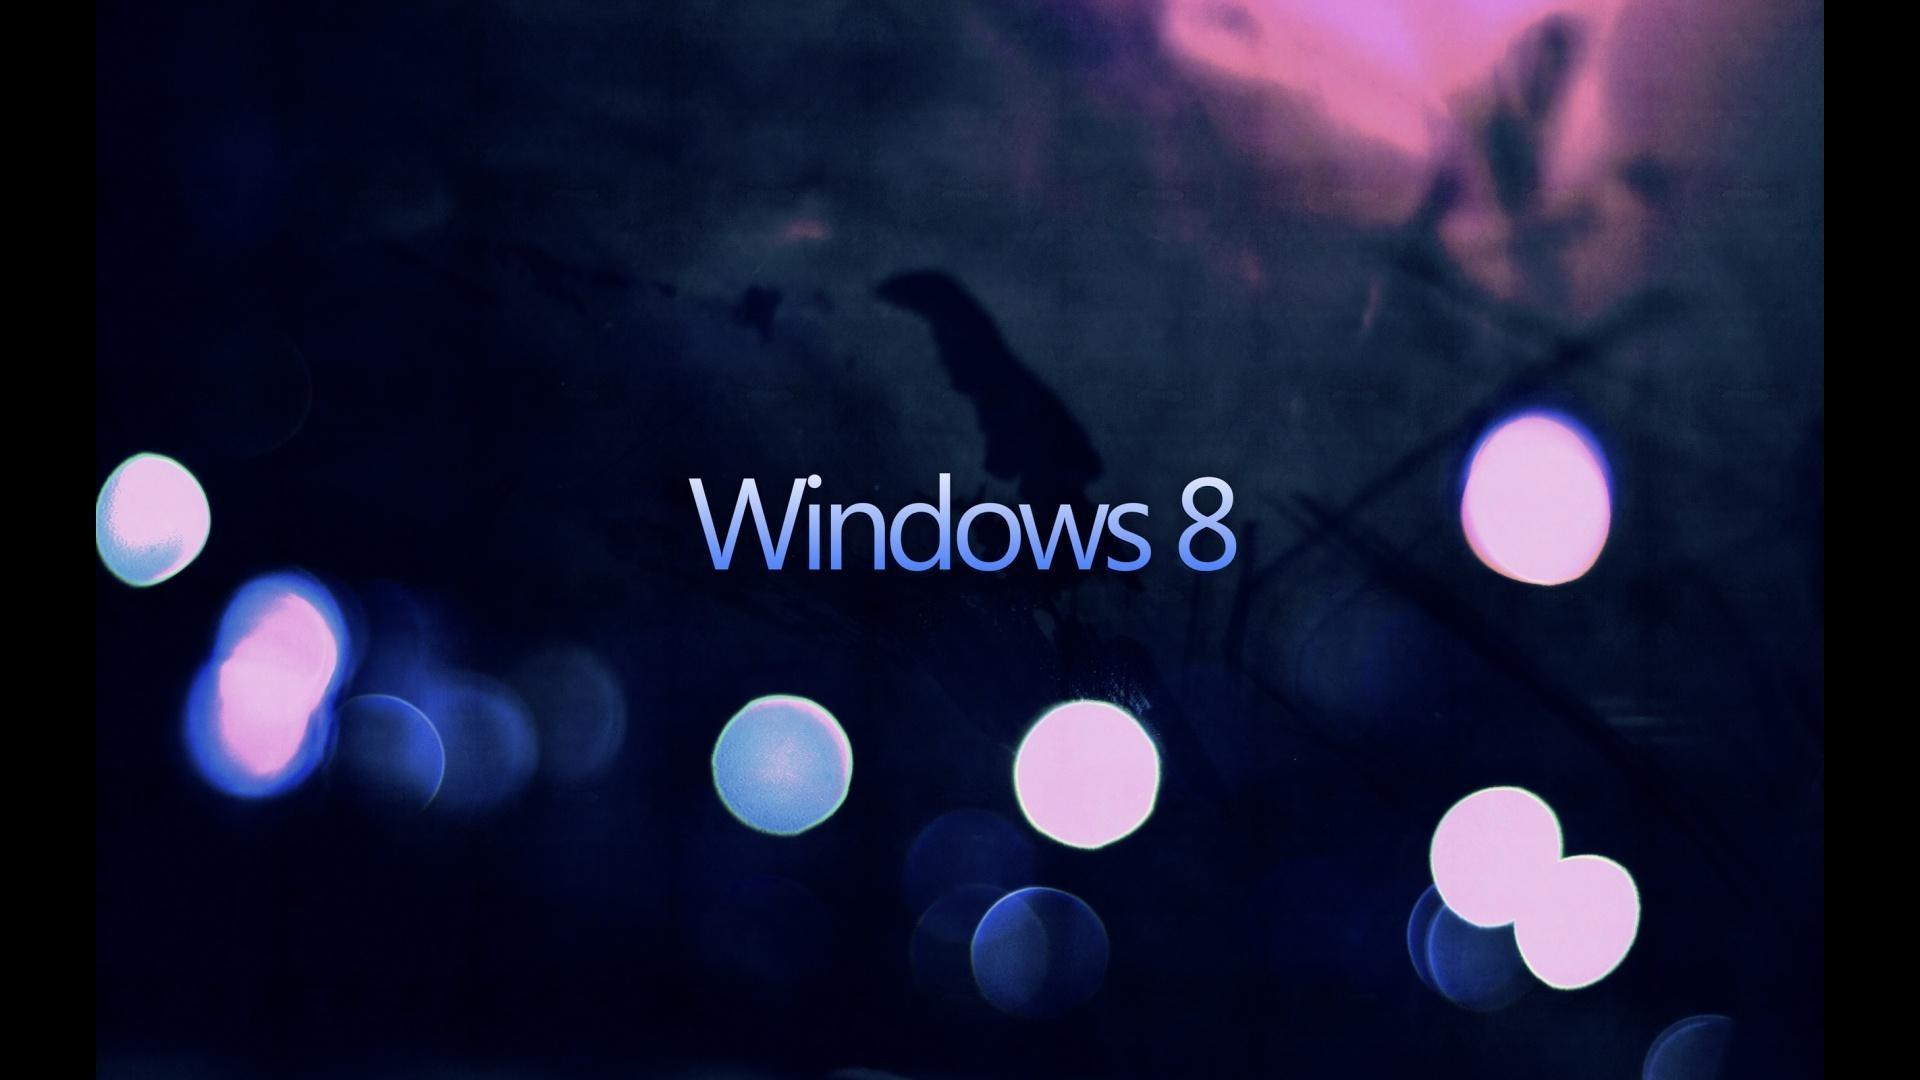 Set Live Wallpapers & Animated Desktop Backgrounds in Windows 10 .